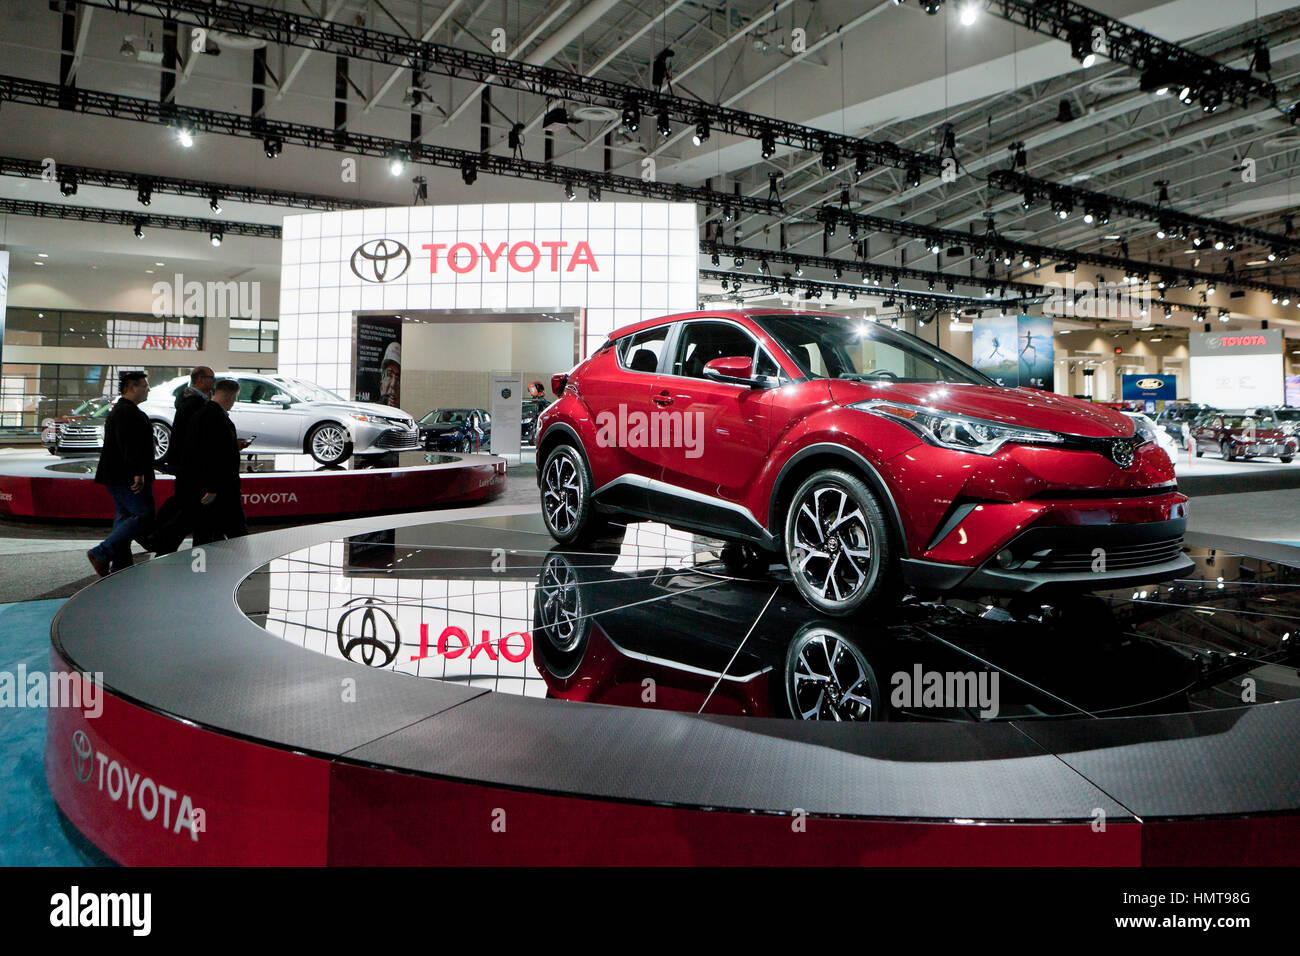 Japanese Auto Stock Photos Japanese Auto Stock Images Alamy - Washington dc car show 2018